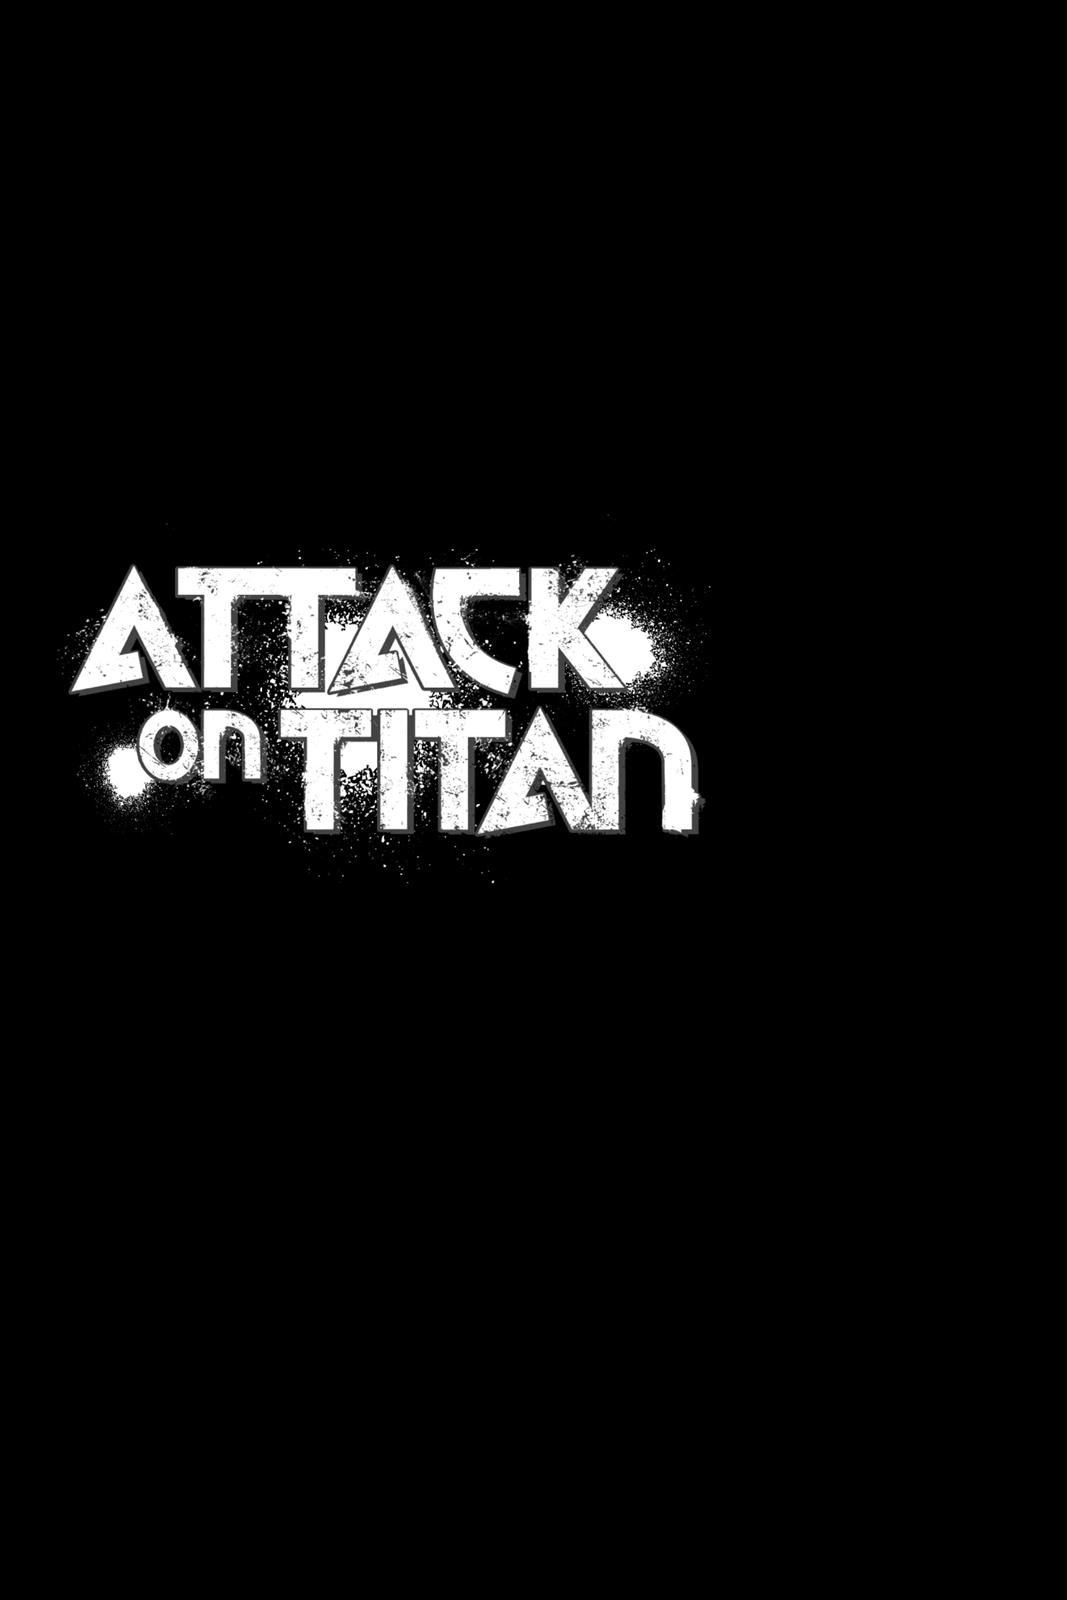 Attack On Titan, Episode 107 image 004